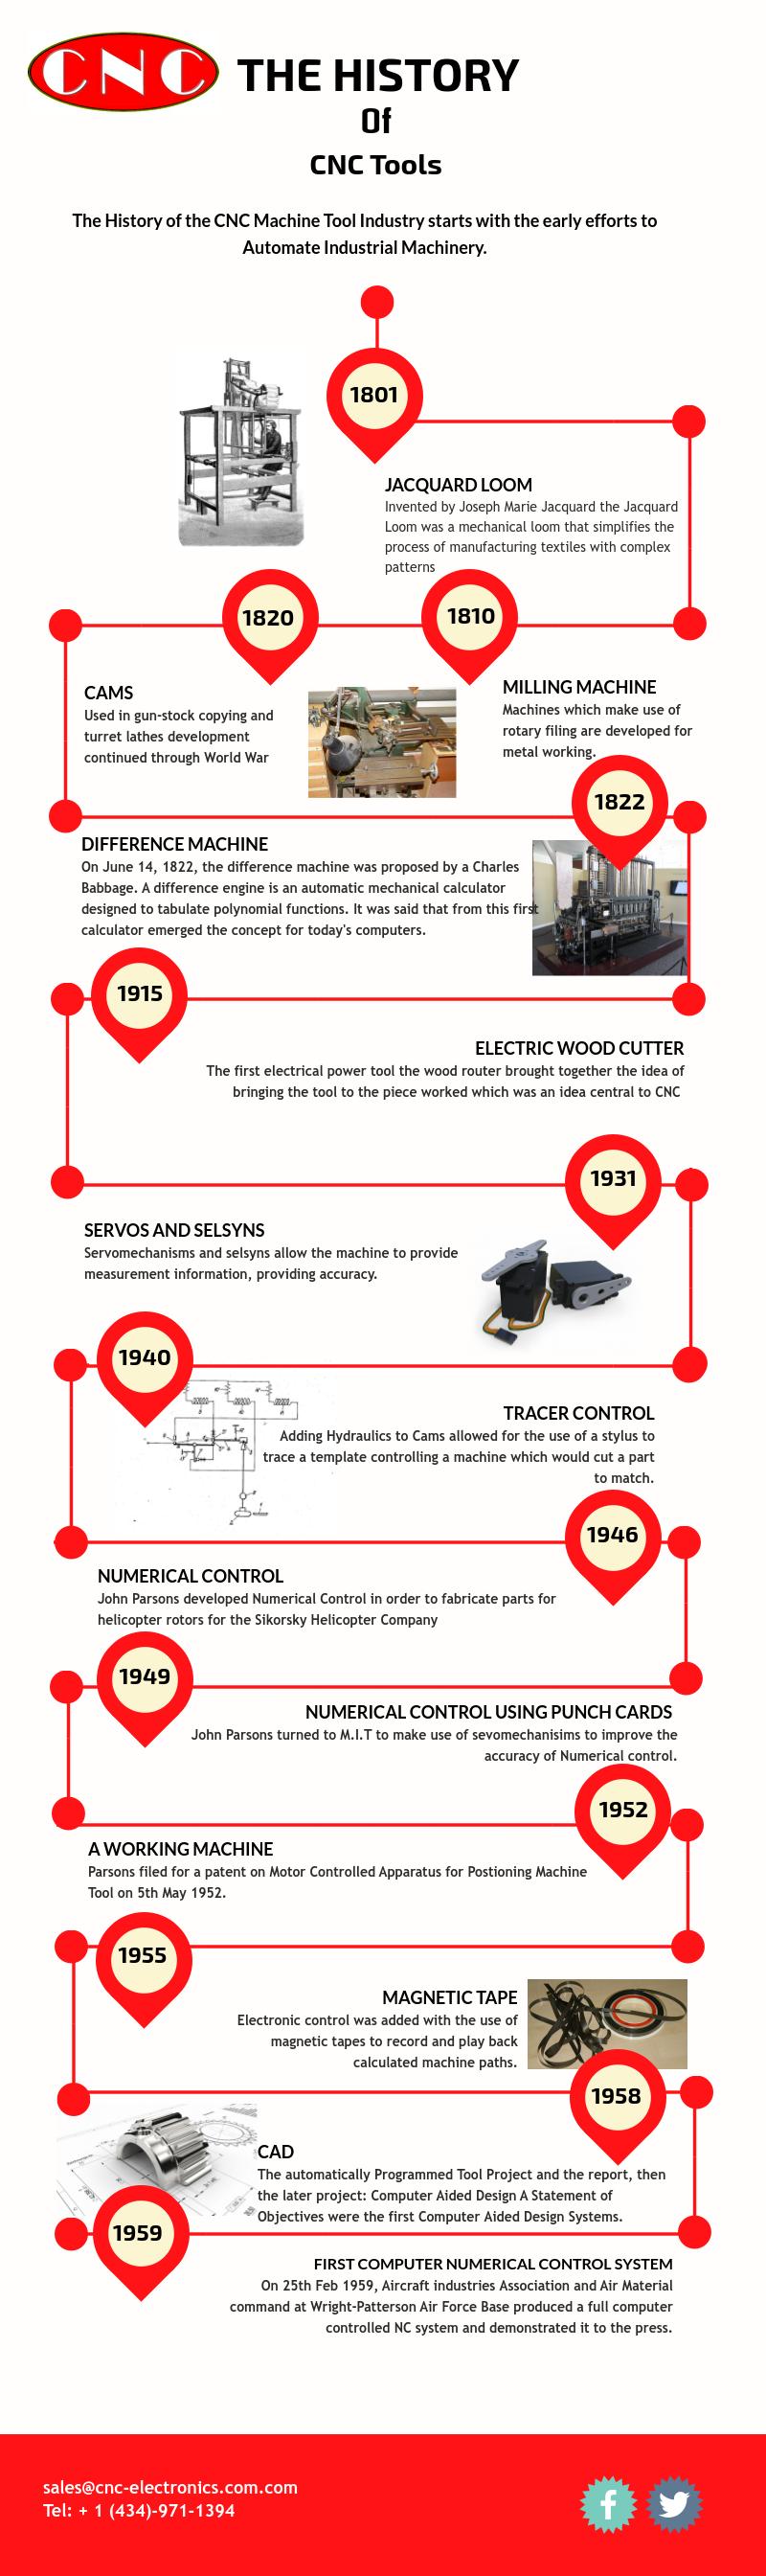 History of CNC Tools